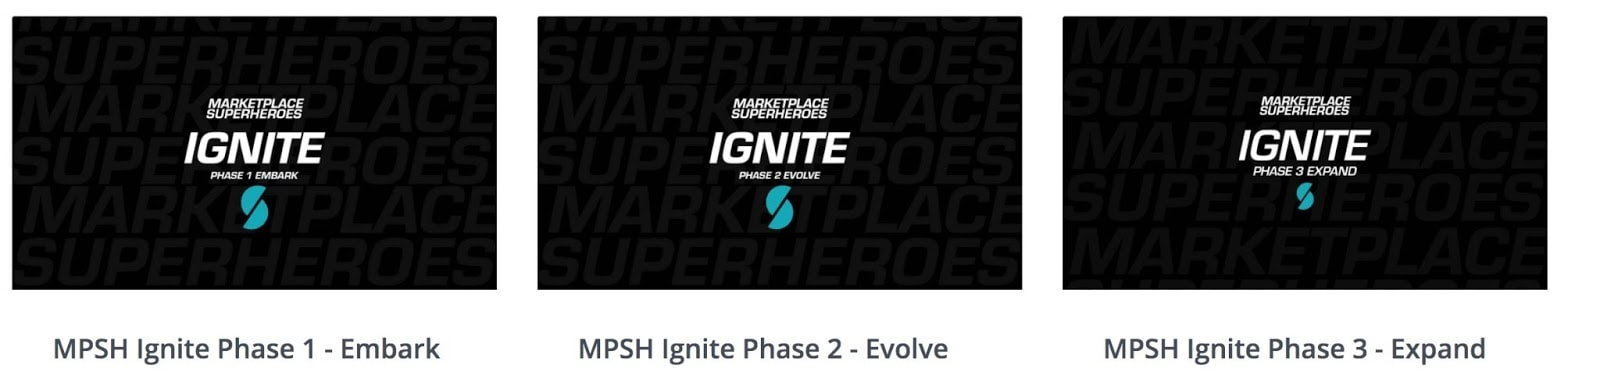 Marketplace SuperHeroes Ignite Program Course Breakdown